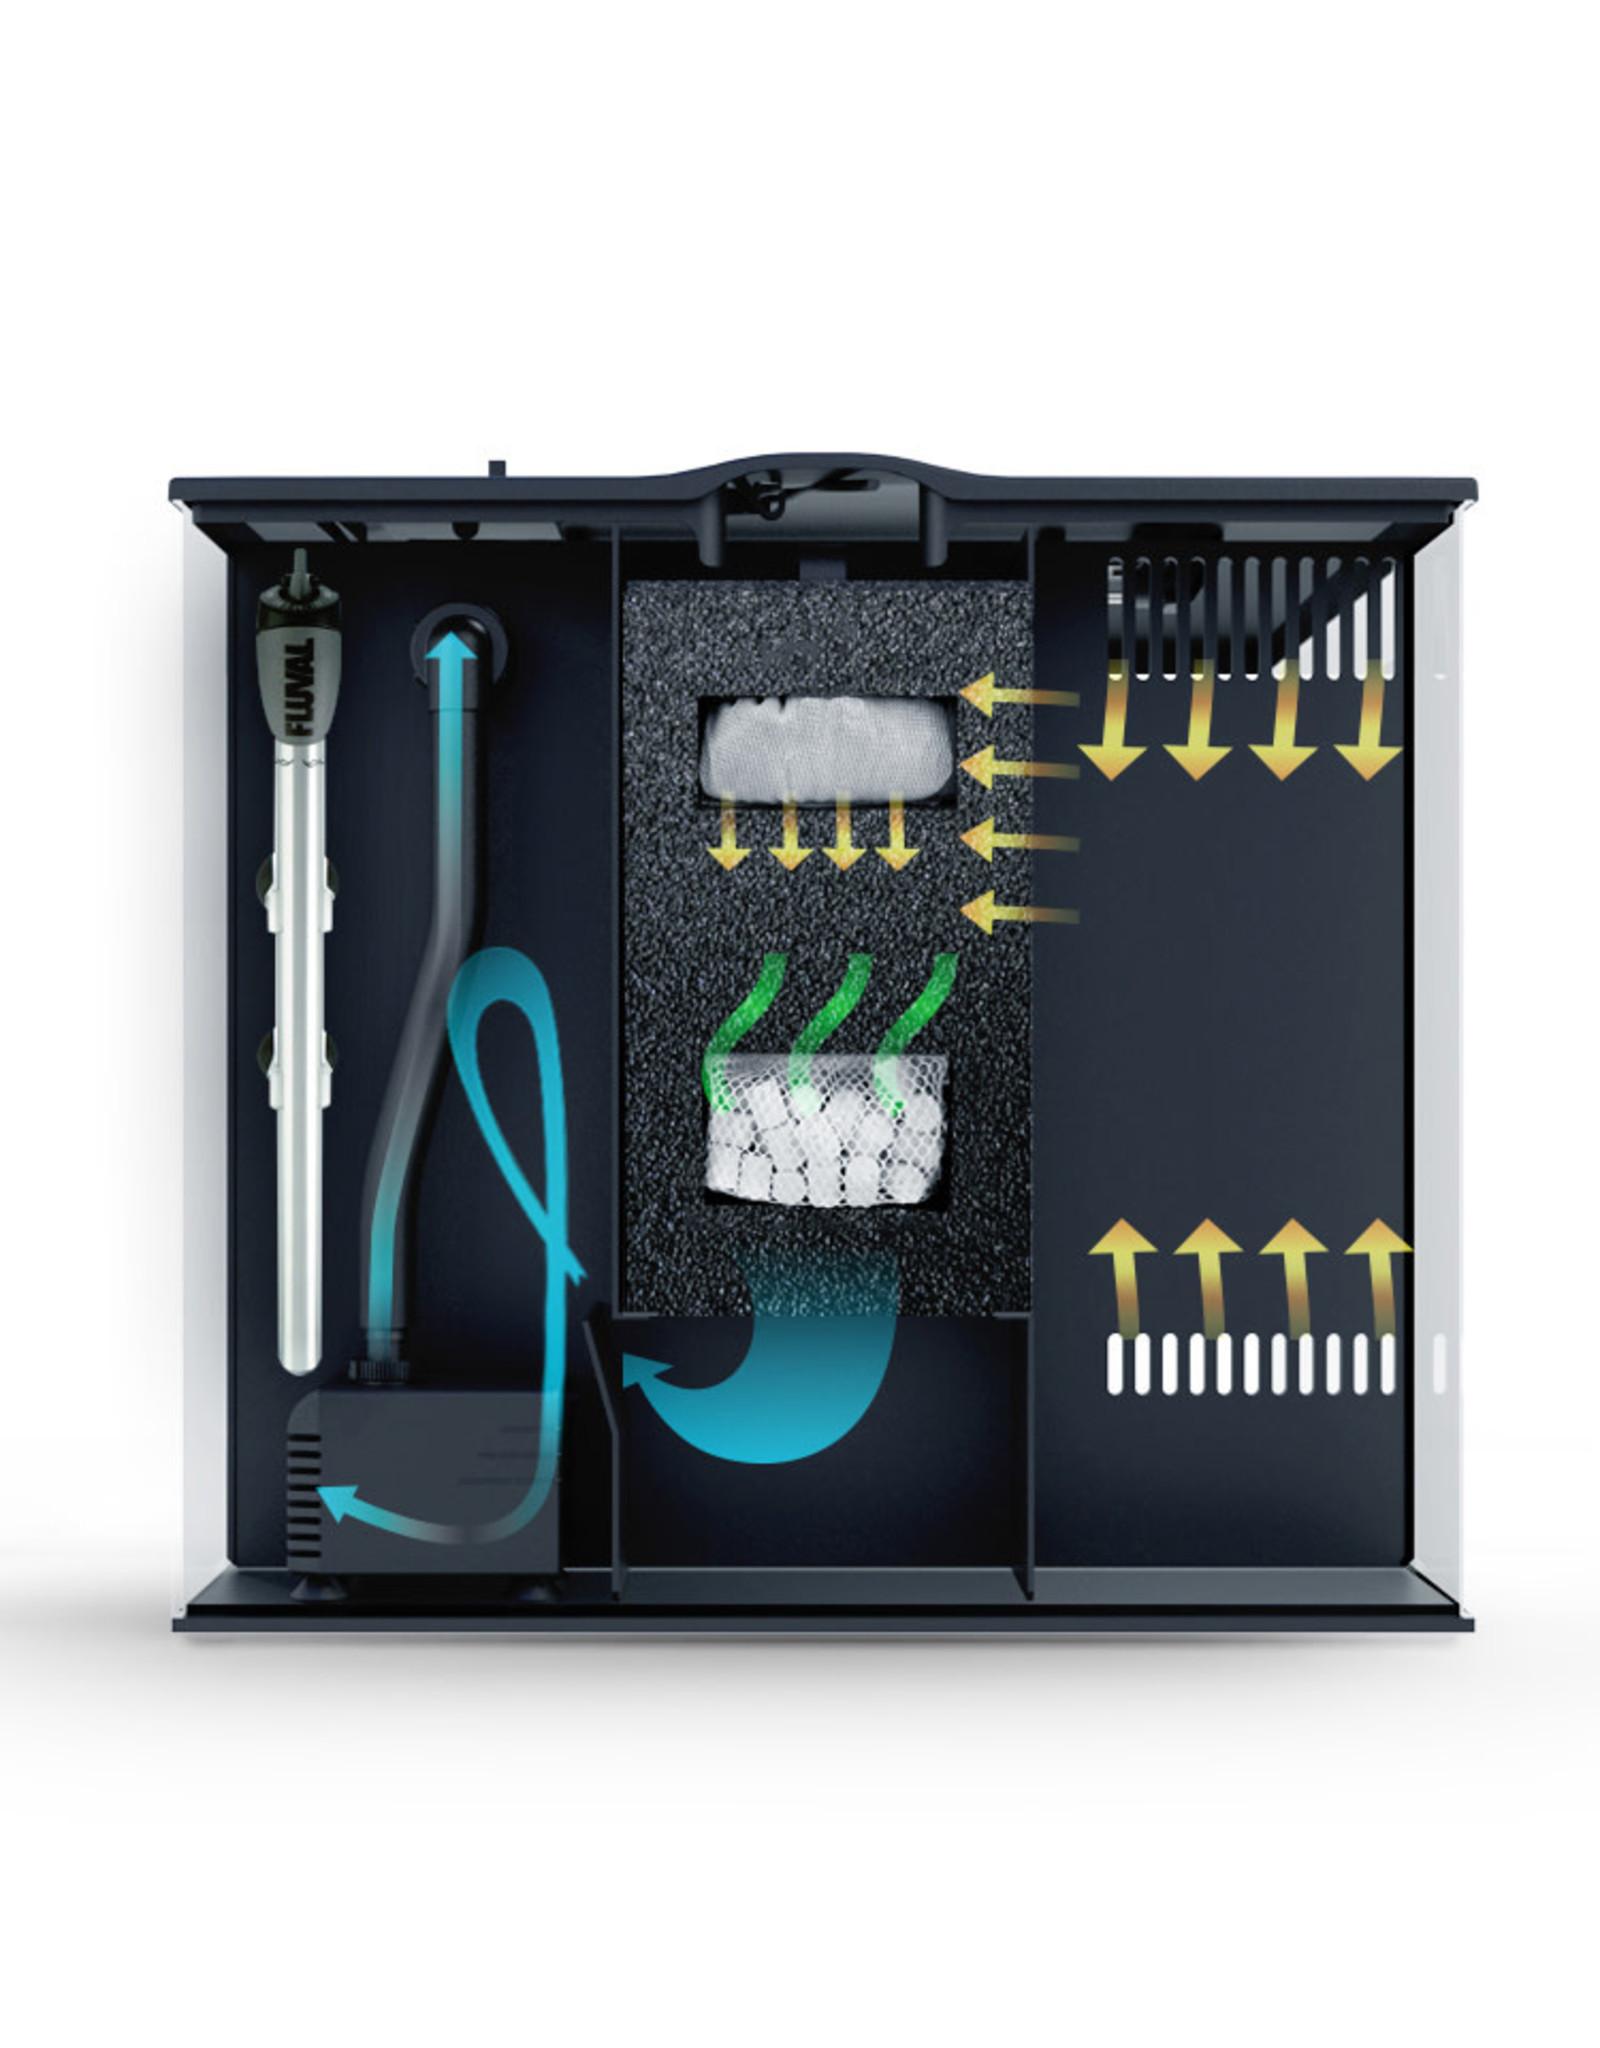 Fluval Fluval FLEX Aquarium Kit - Black 34 L (9 US gal)